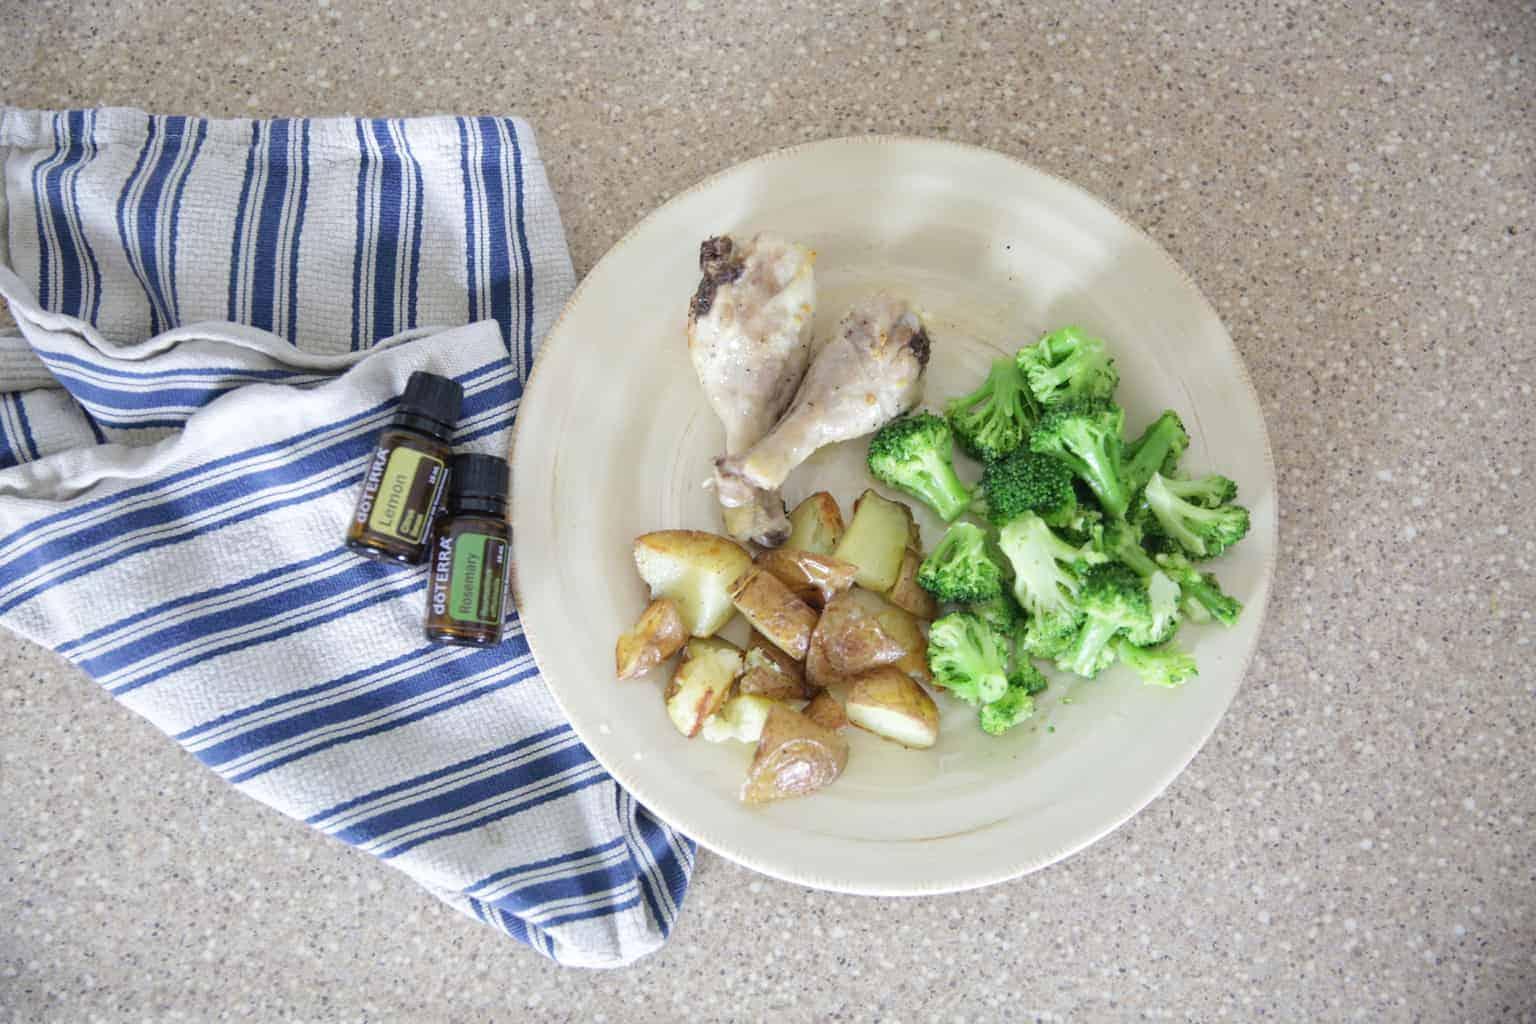 Lemon Rosemary Chicken Roasted Rosemary Potatoes And Lemon Pepper Broccoli Our Oily House